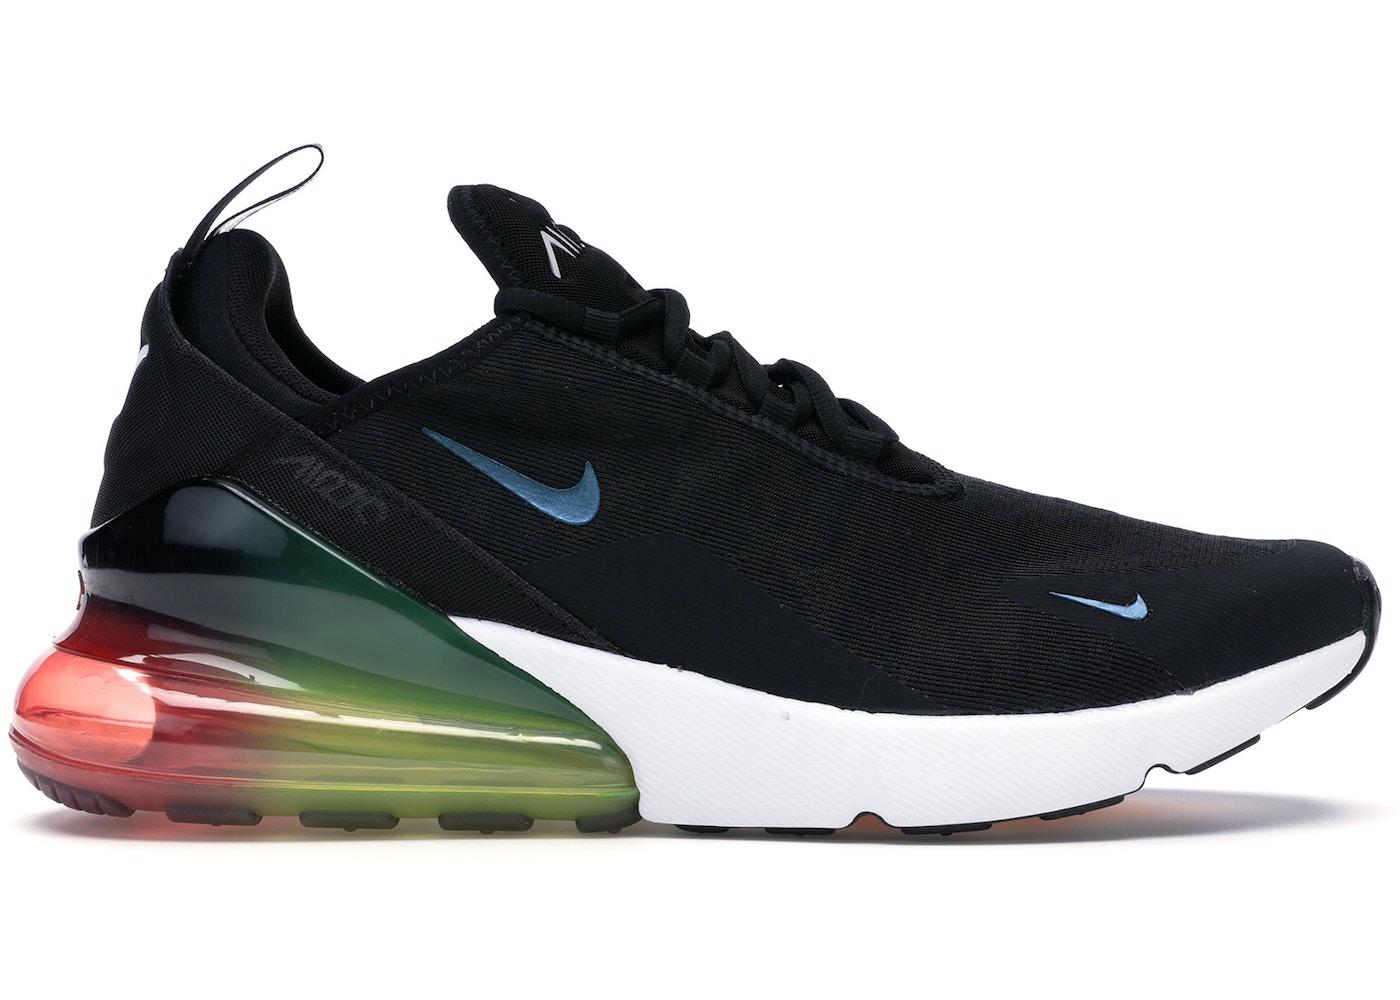 hot sale online fb733 334d4 Buy Nike Air Max 270 Shoes & Deadstock Sneakers